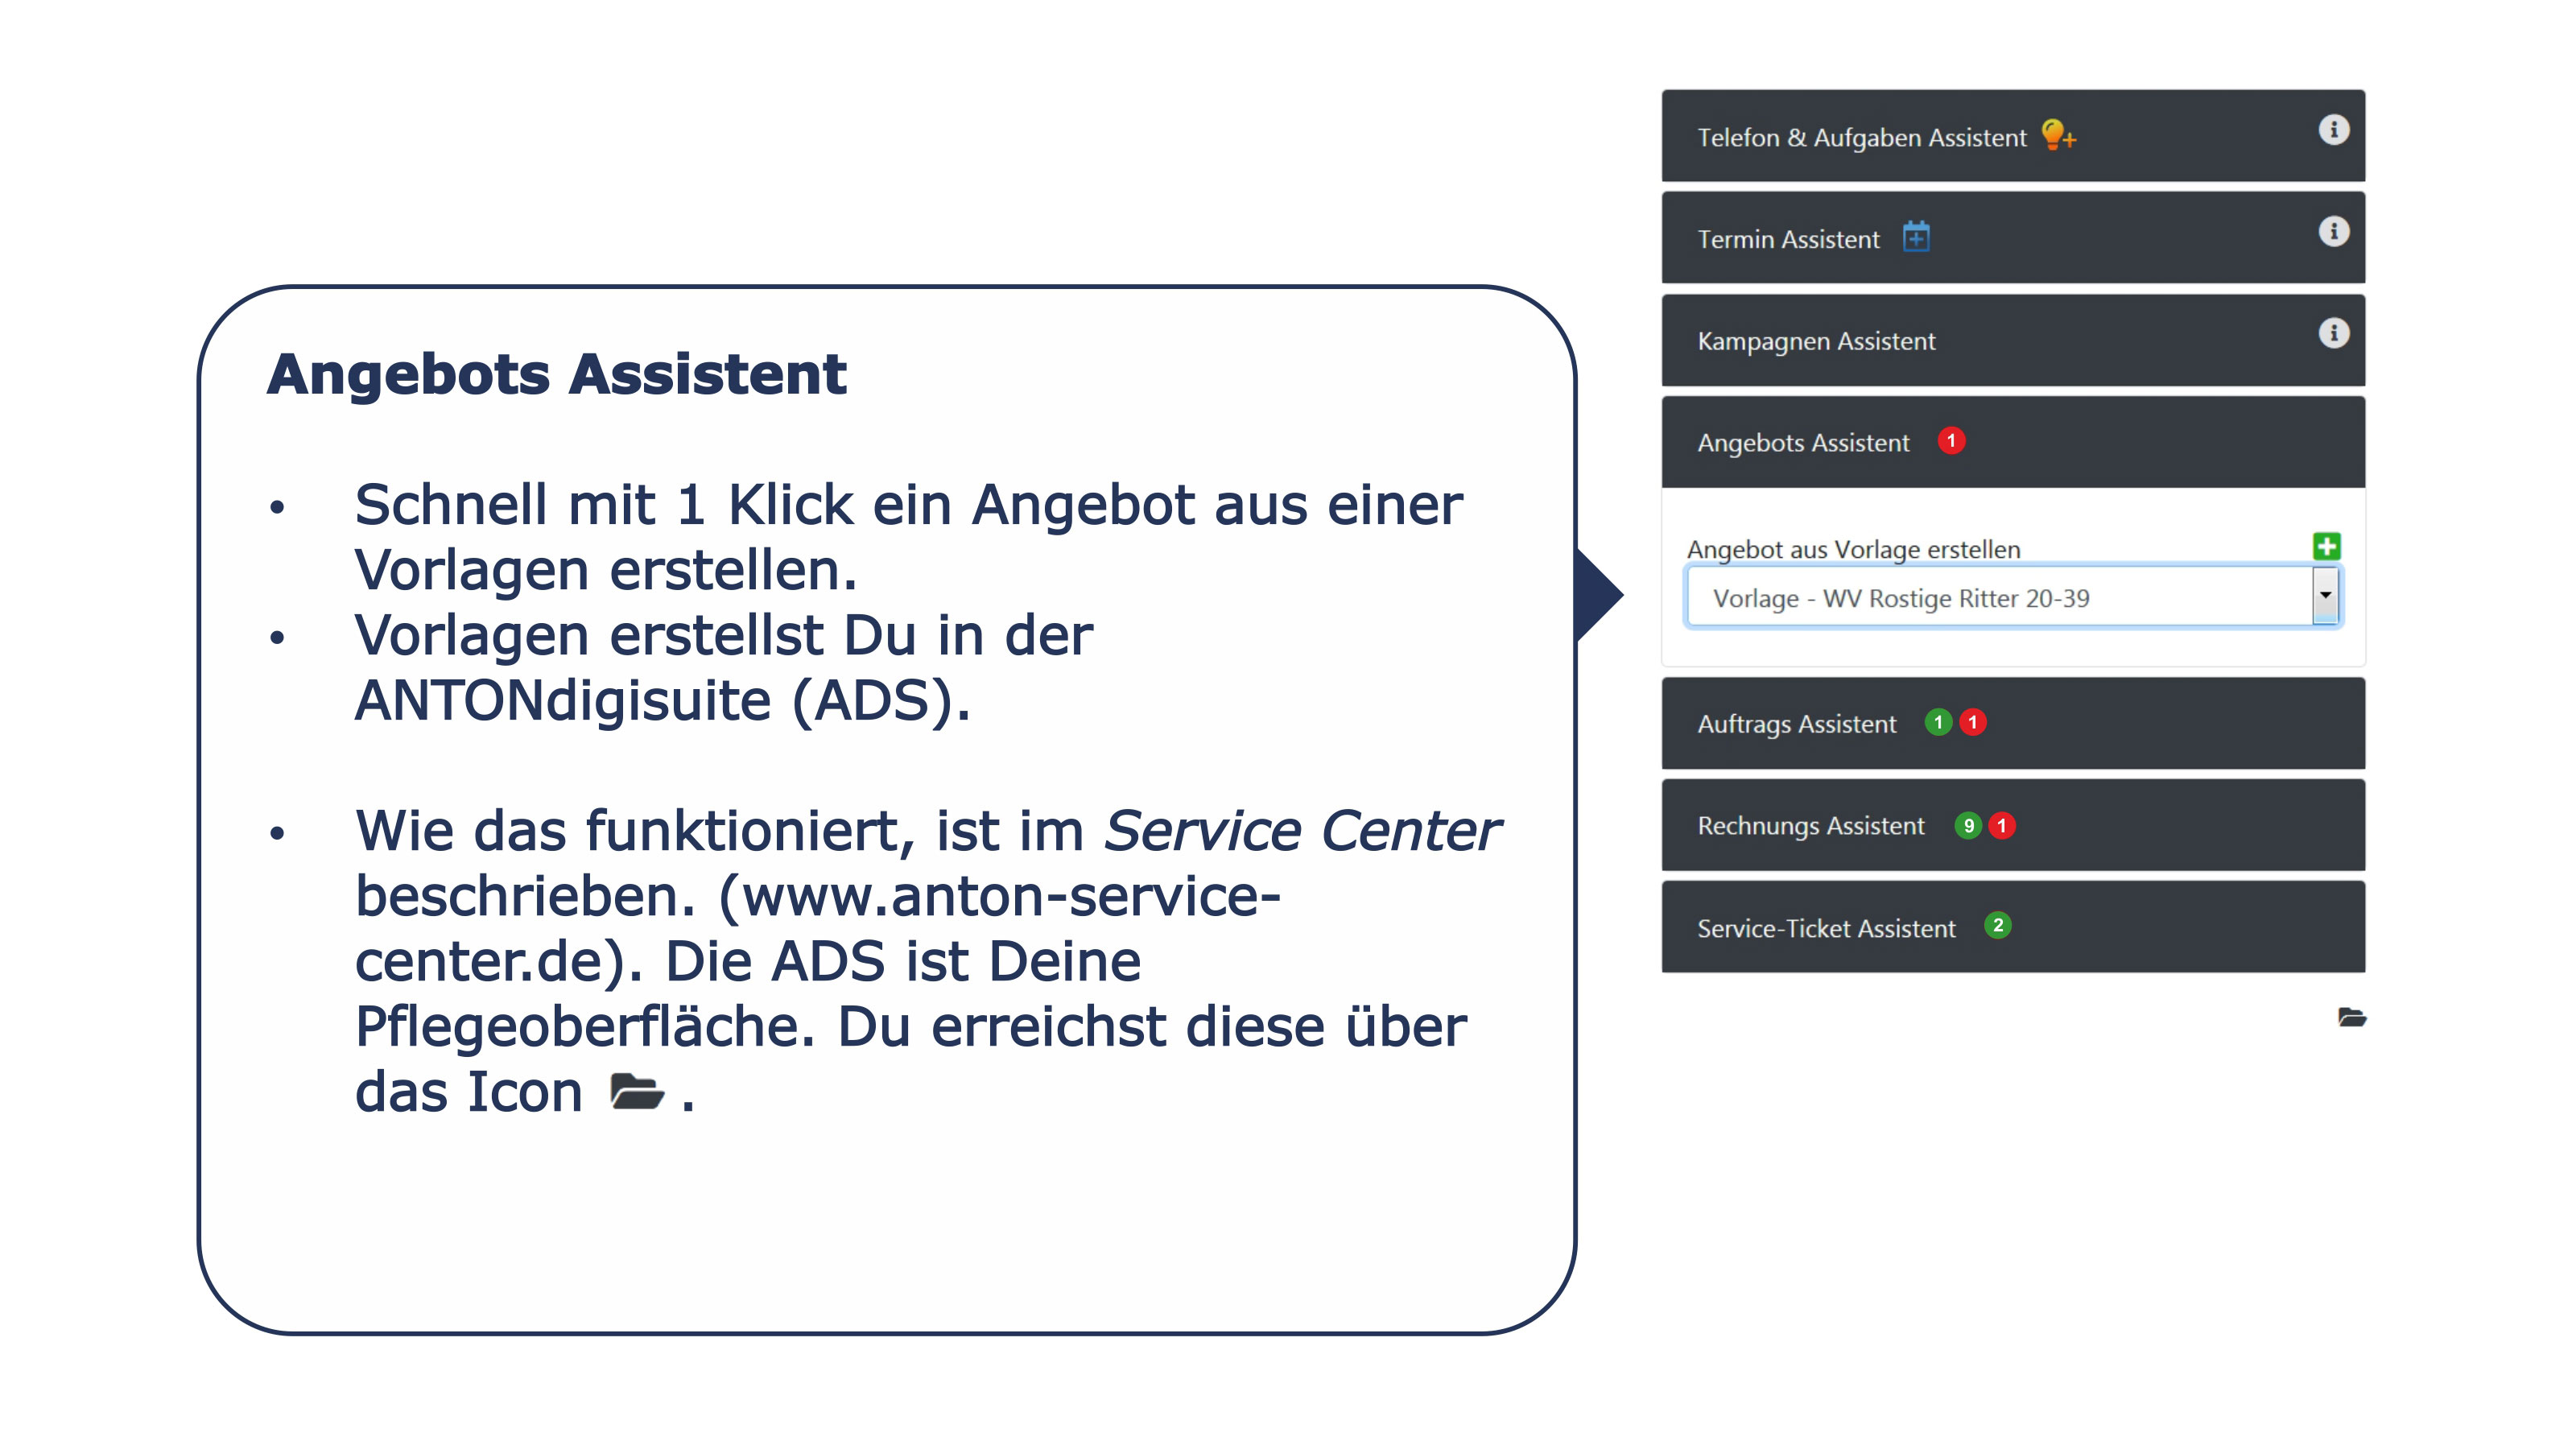 Ansprechpartner Detail Angebots Assistent